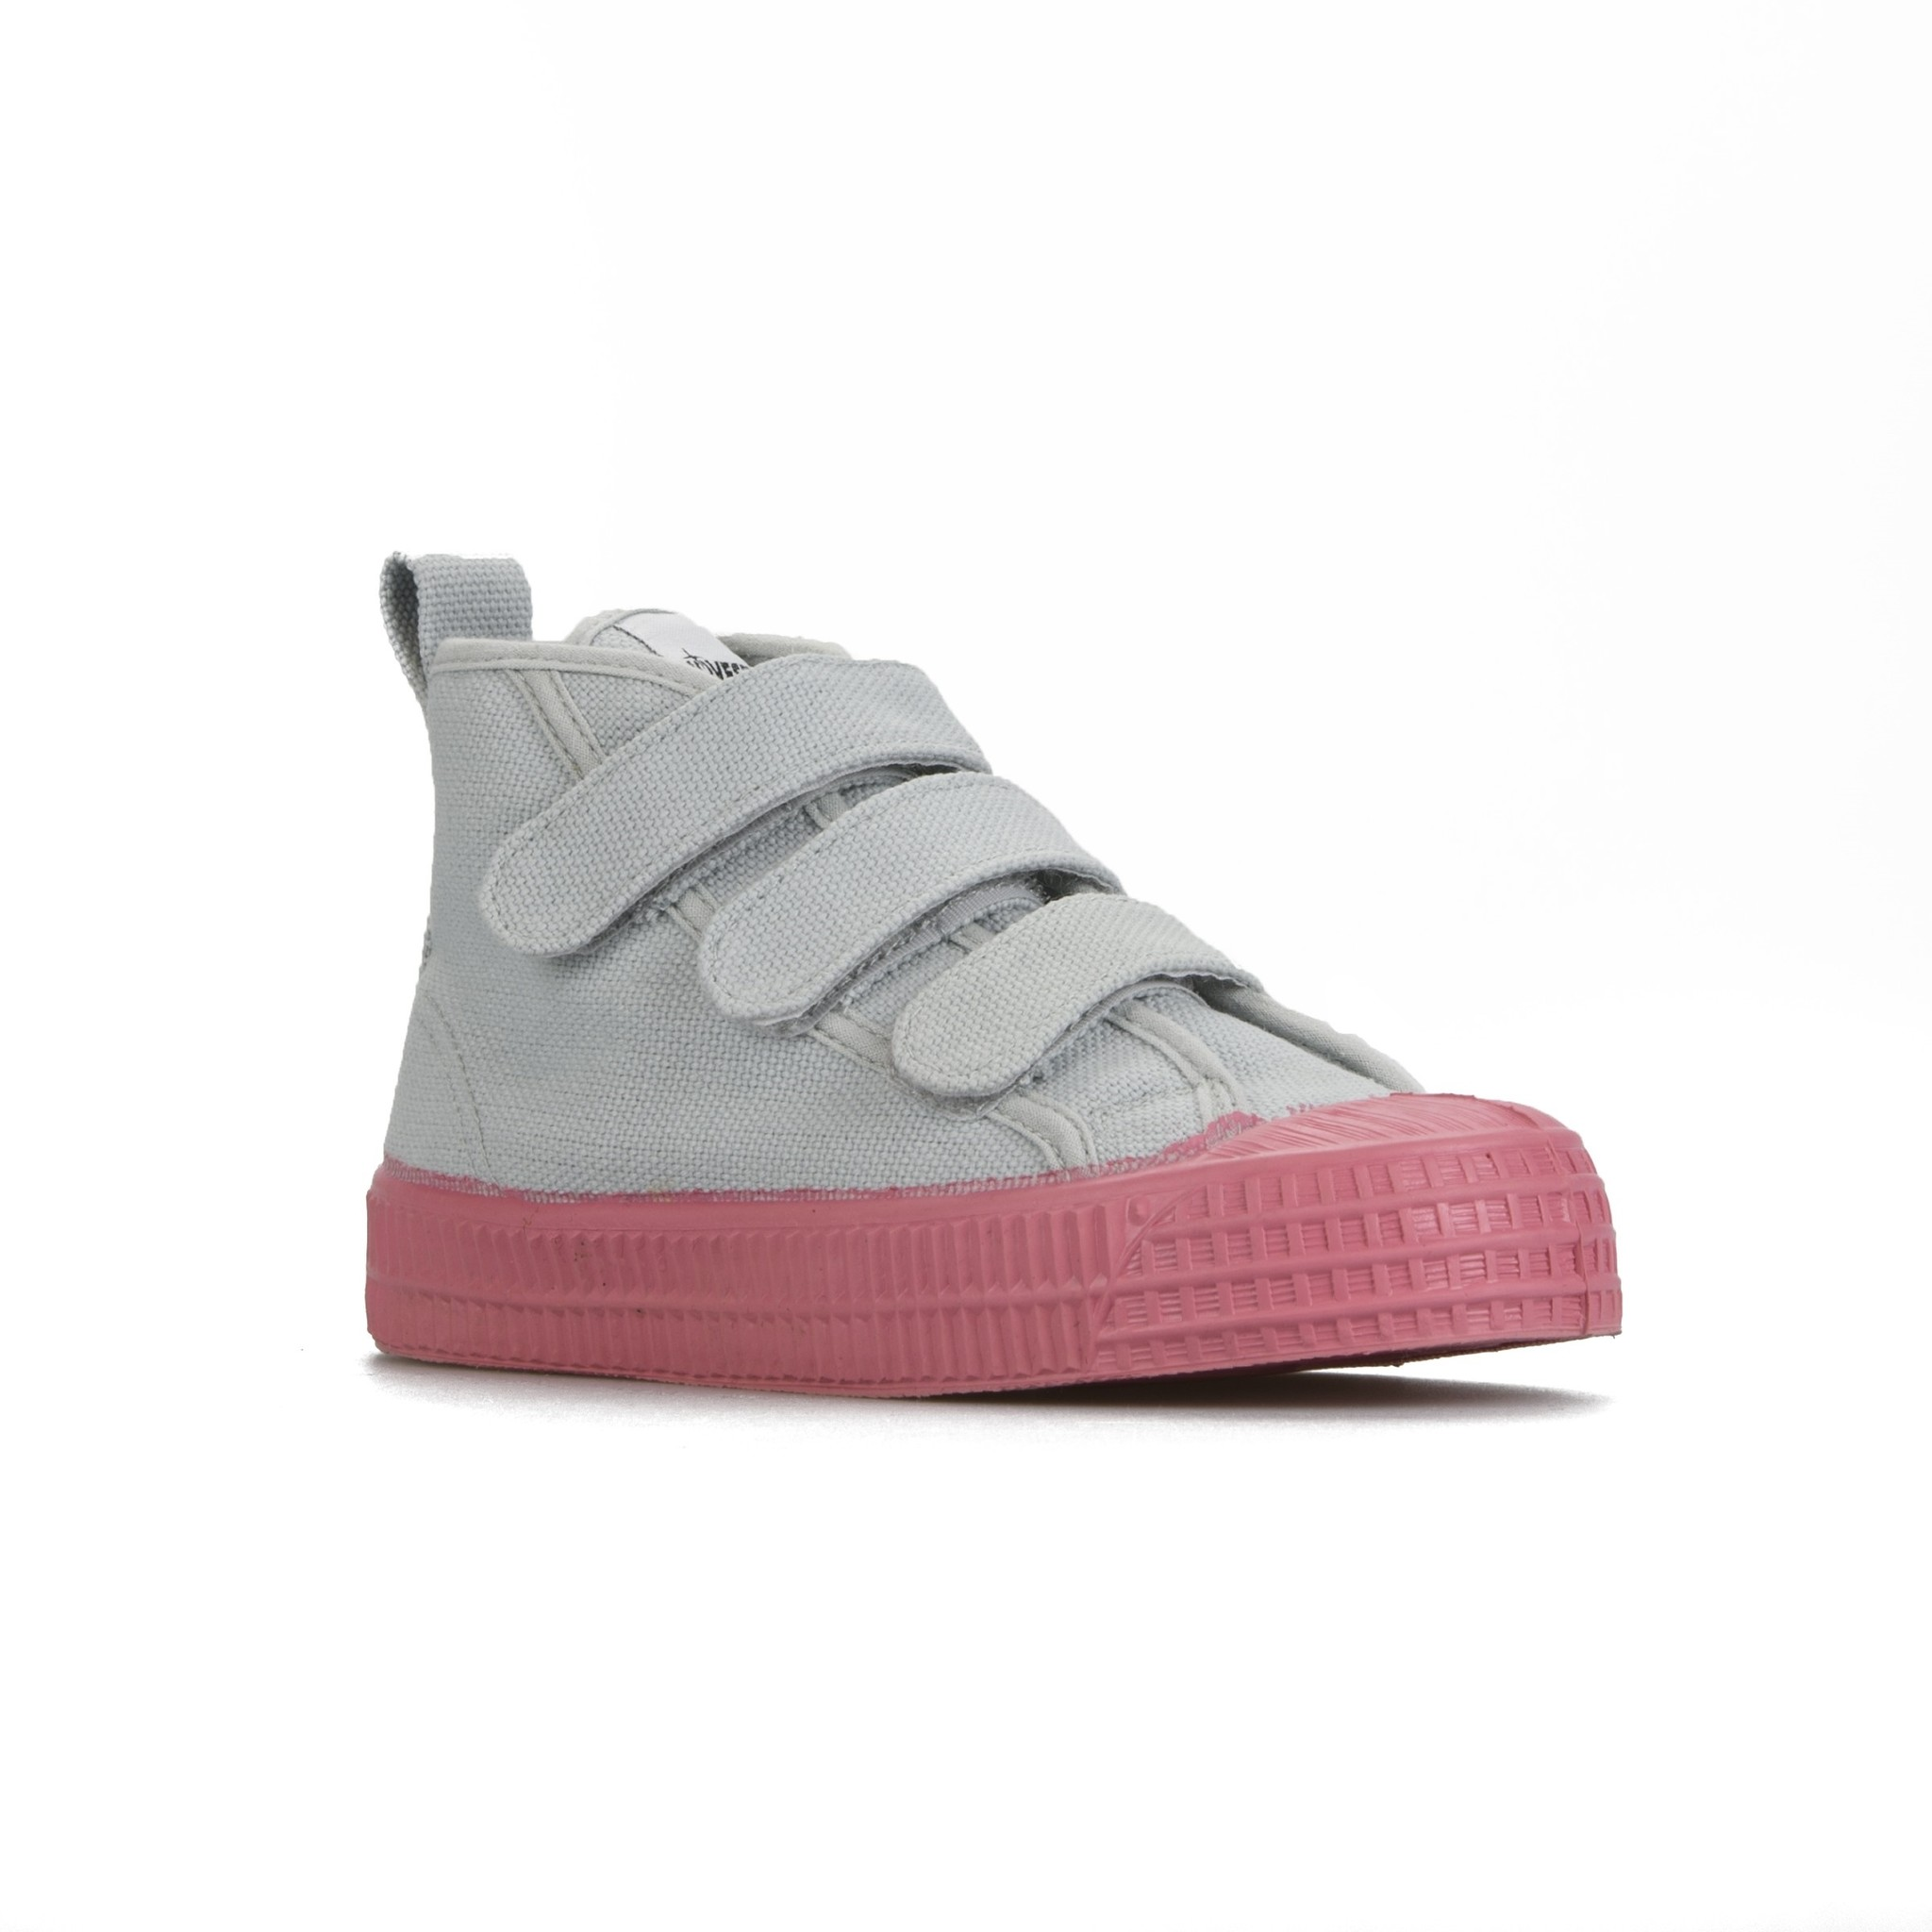 STAR DRIBBLE KID - Grey / Pink-1